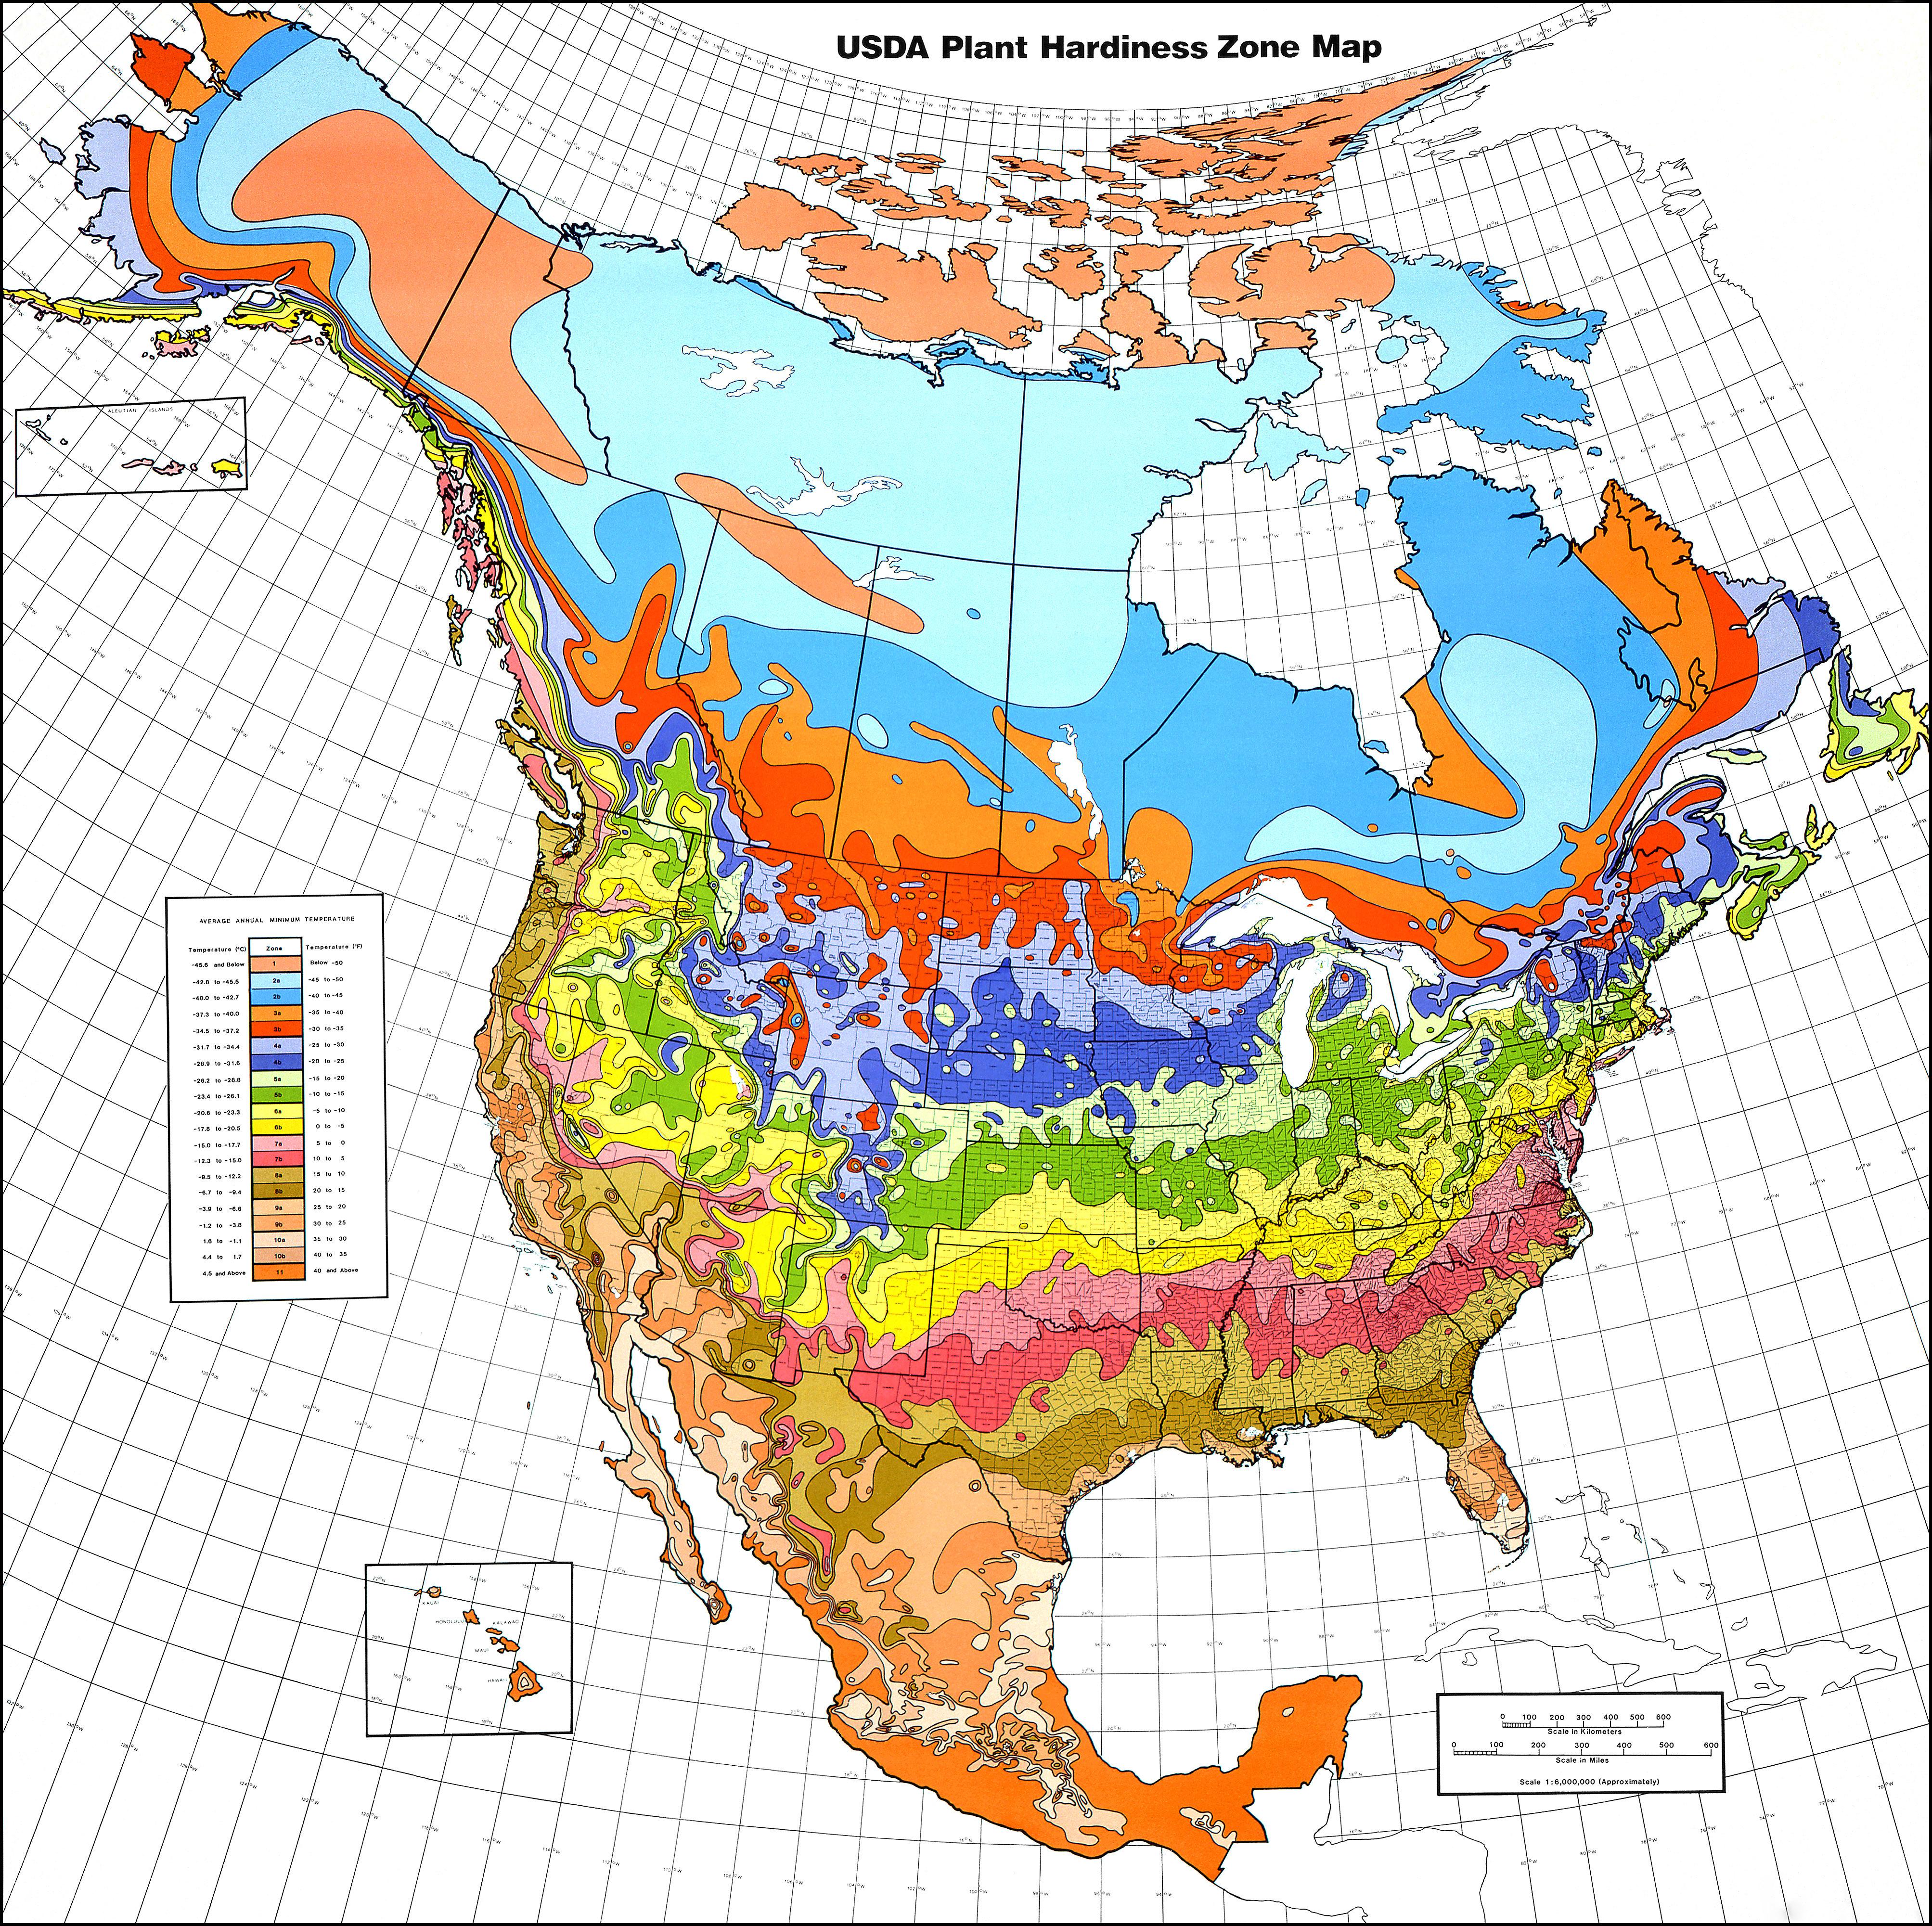 USDA_Hardiness_zone_map.jpg